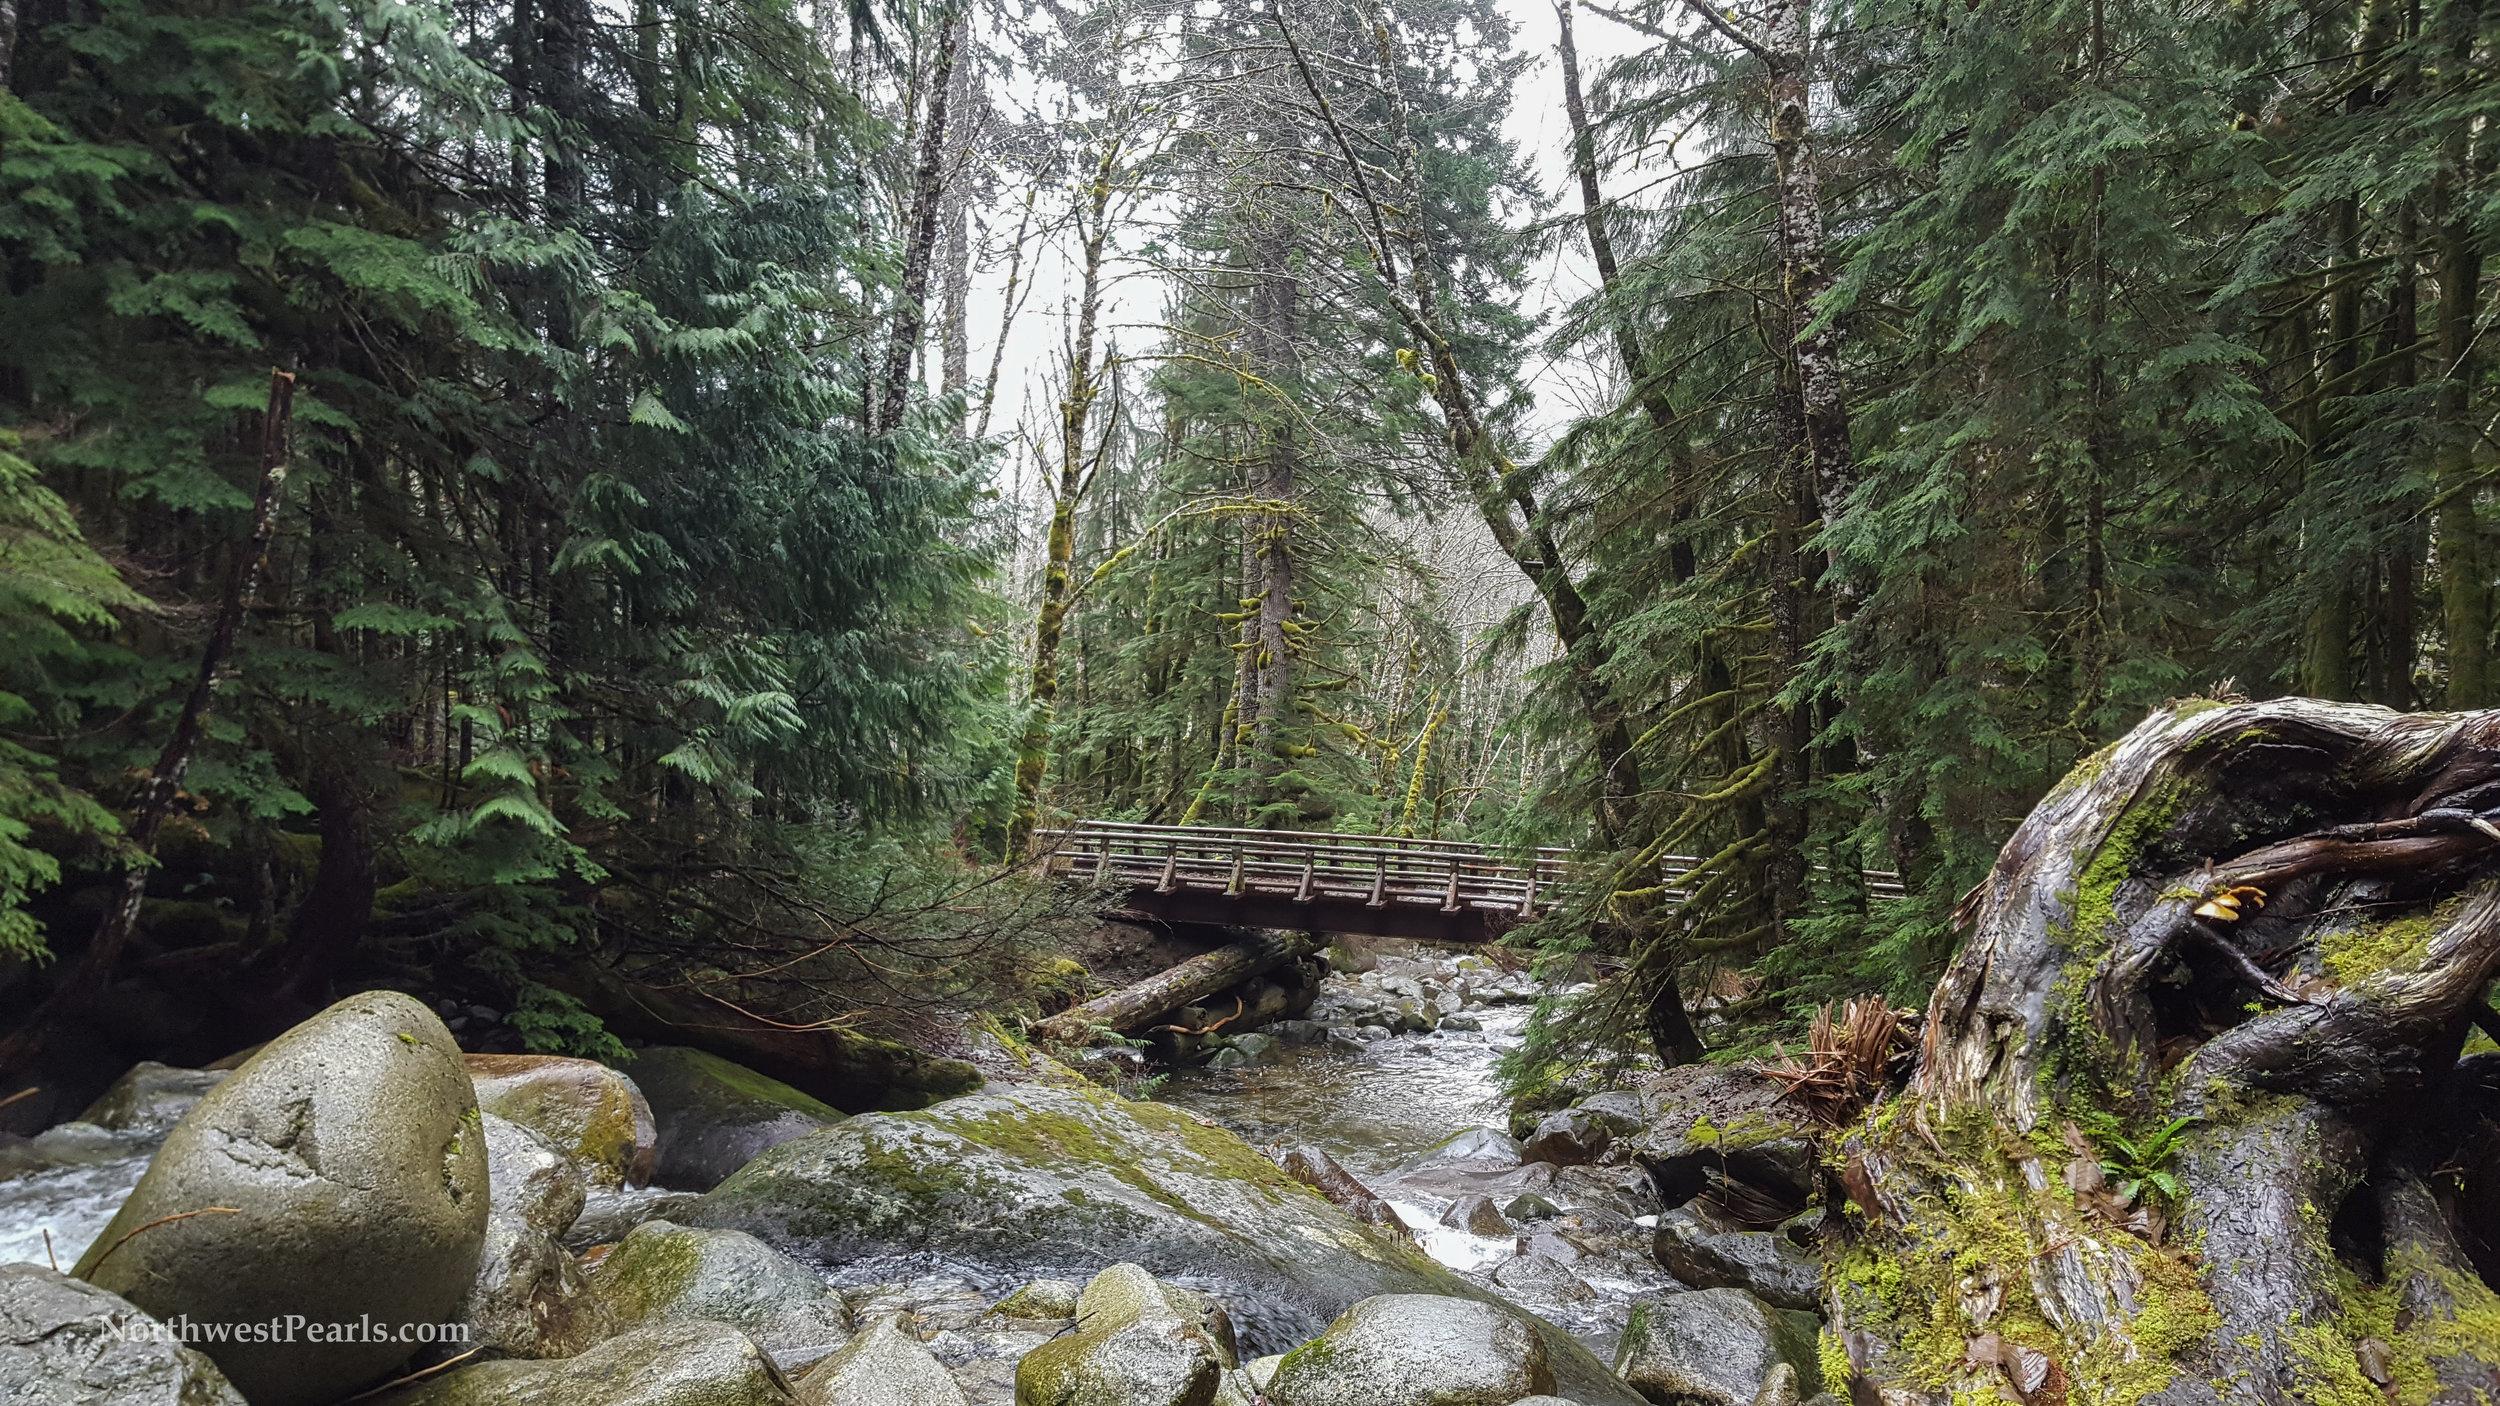 Northwest Pearls: Otter Falls